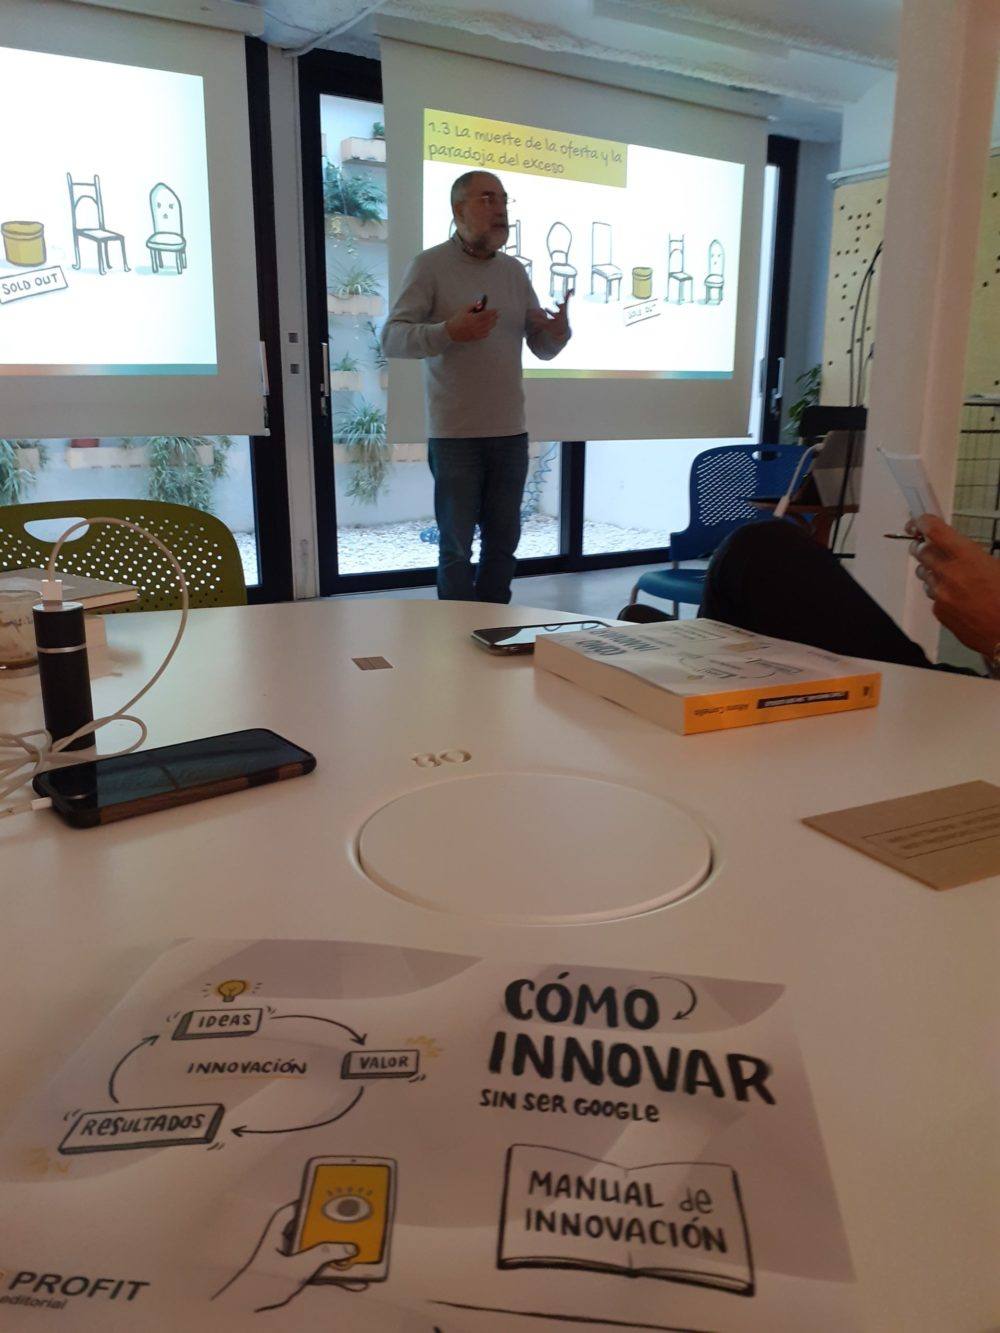 Seminario «Cómo innovar sin ser Google»